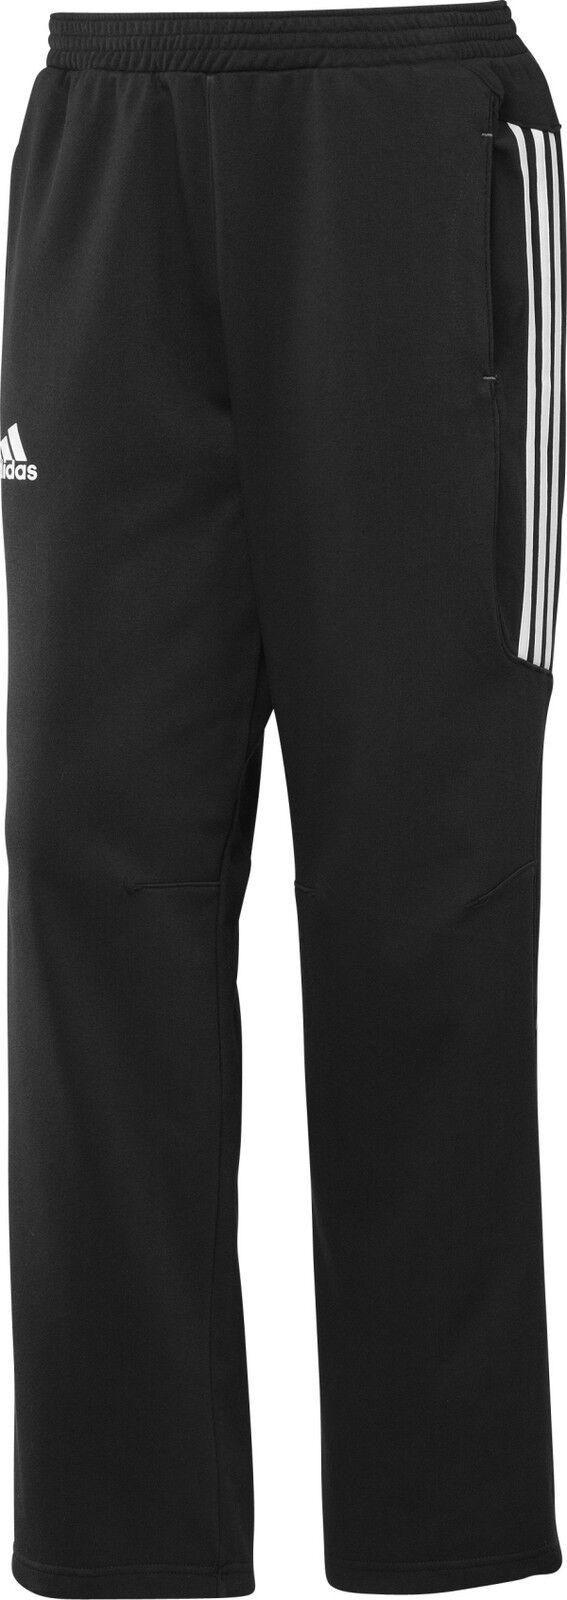 Adidas Jogging hose, Sporthose, Traininshose Baumwolle Gr.XS-XL  | Umweltfreundlich